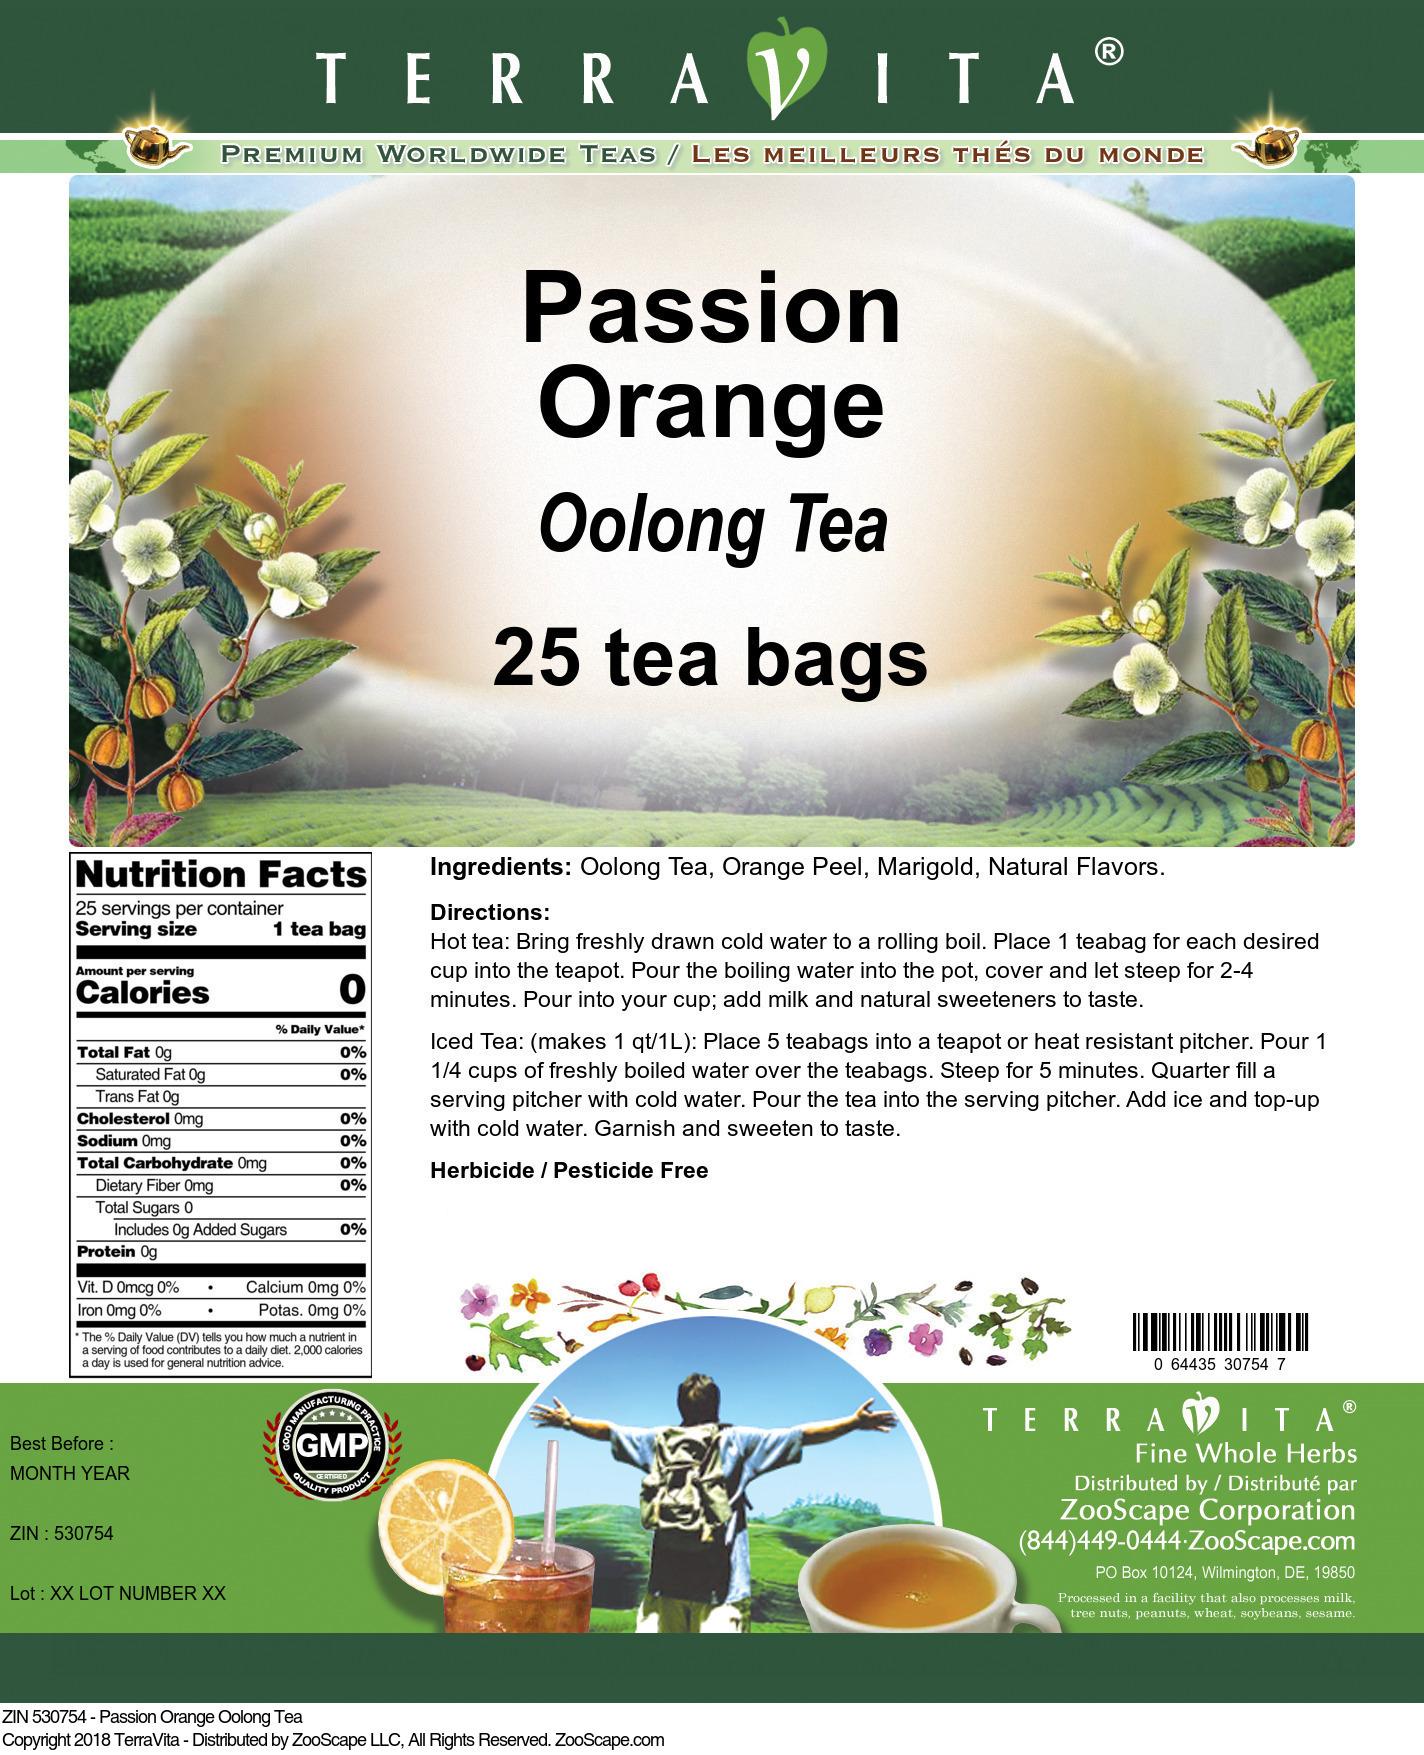 Passion Orange Oolong Tea